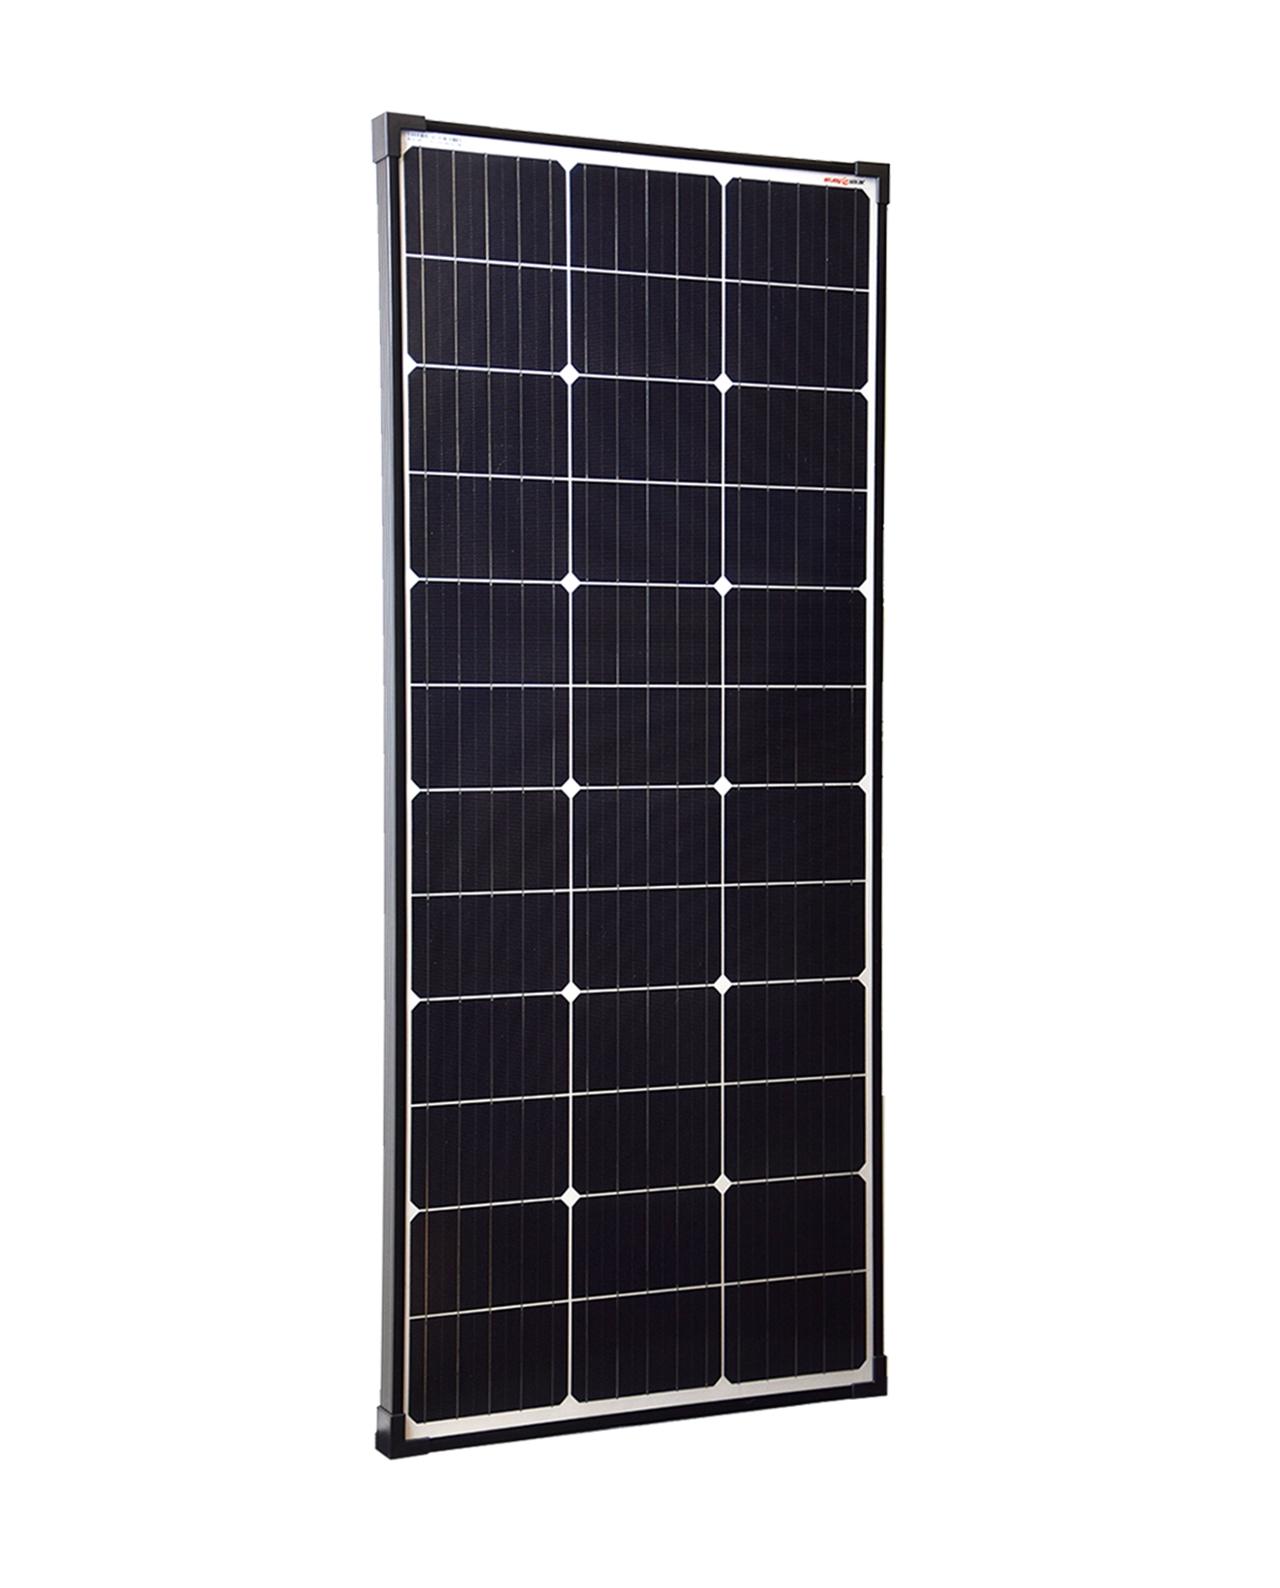 200 Watt Zonnepaneel Set PERC Monokristal 1480x670 mm